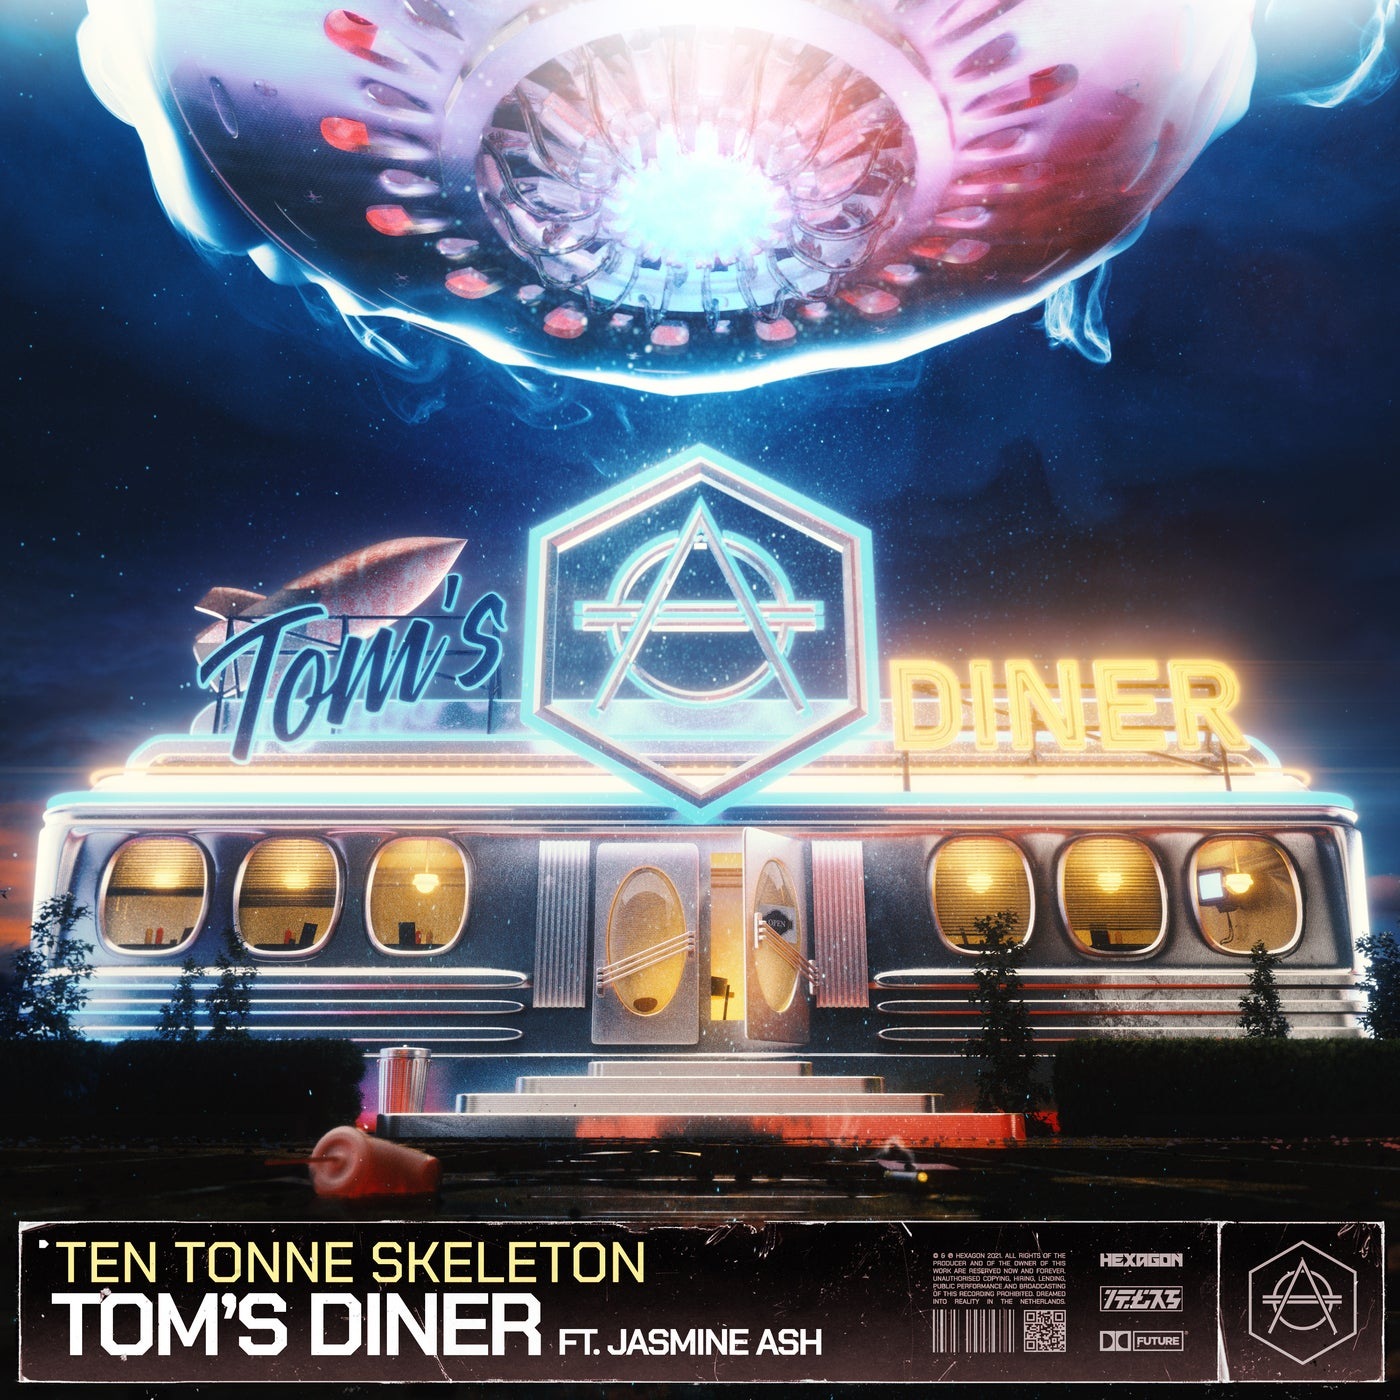 Tom's Diner feat. Jasmine Ash